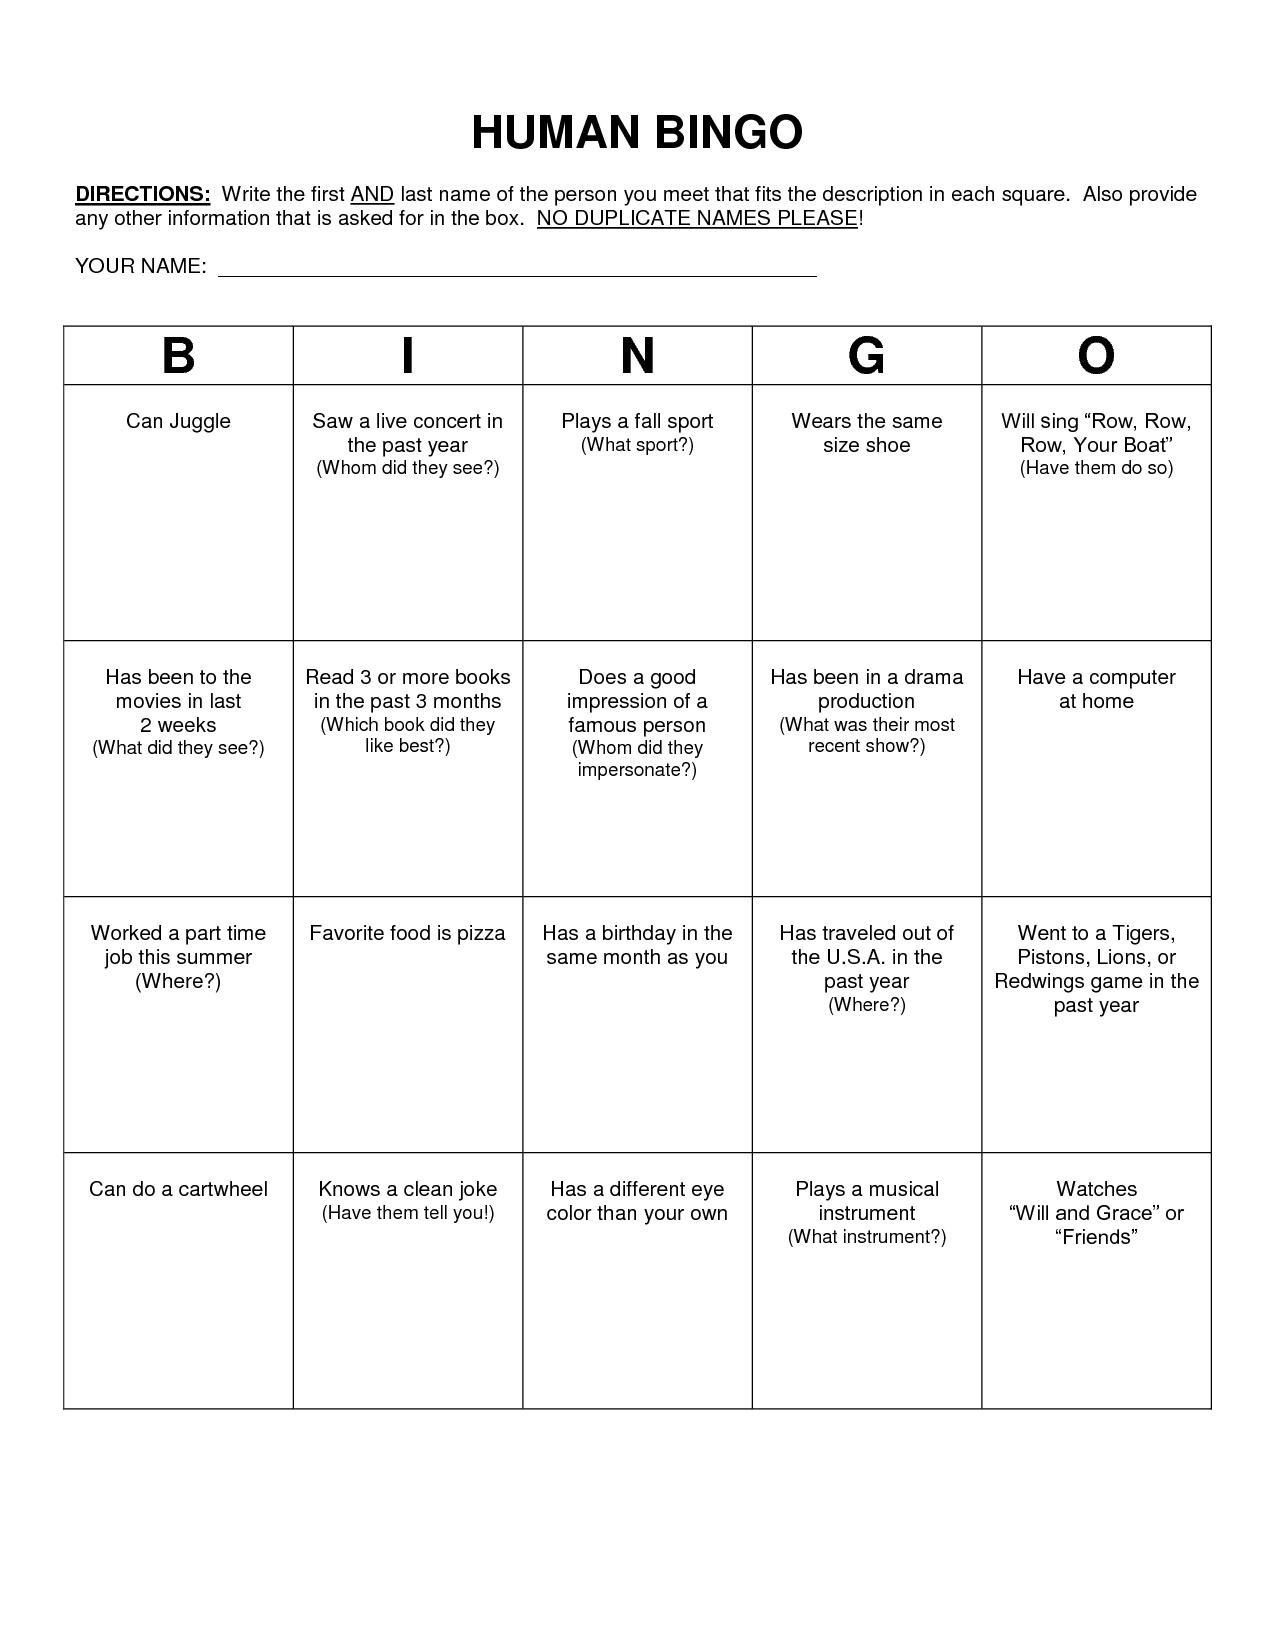 Bingo Spreadsheet Template With Regard To Bingo Spreadsheet  My Spreadsheet Templates